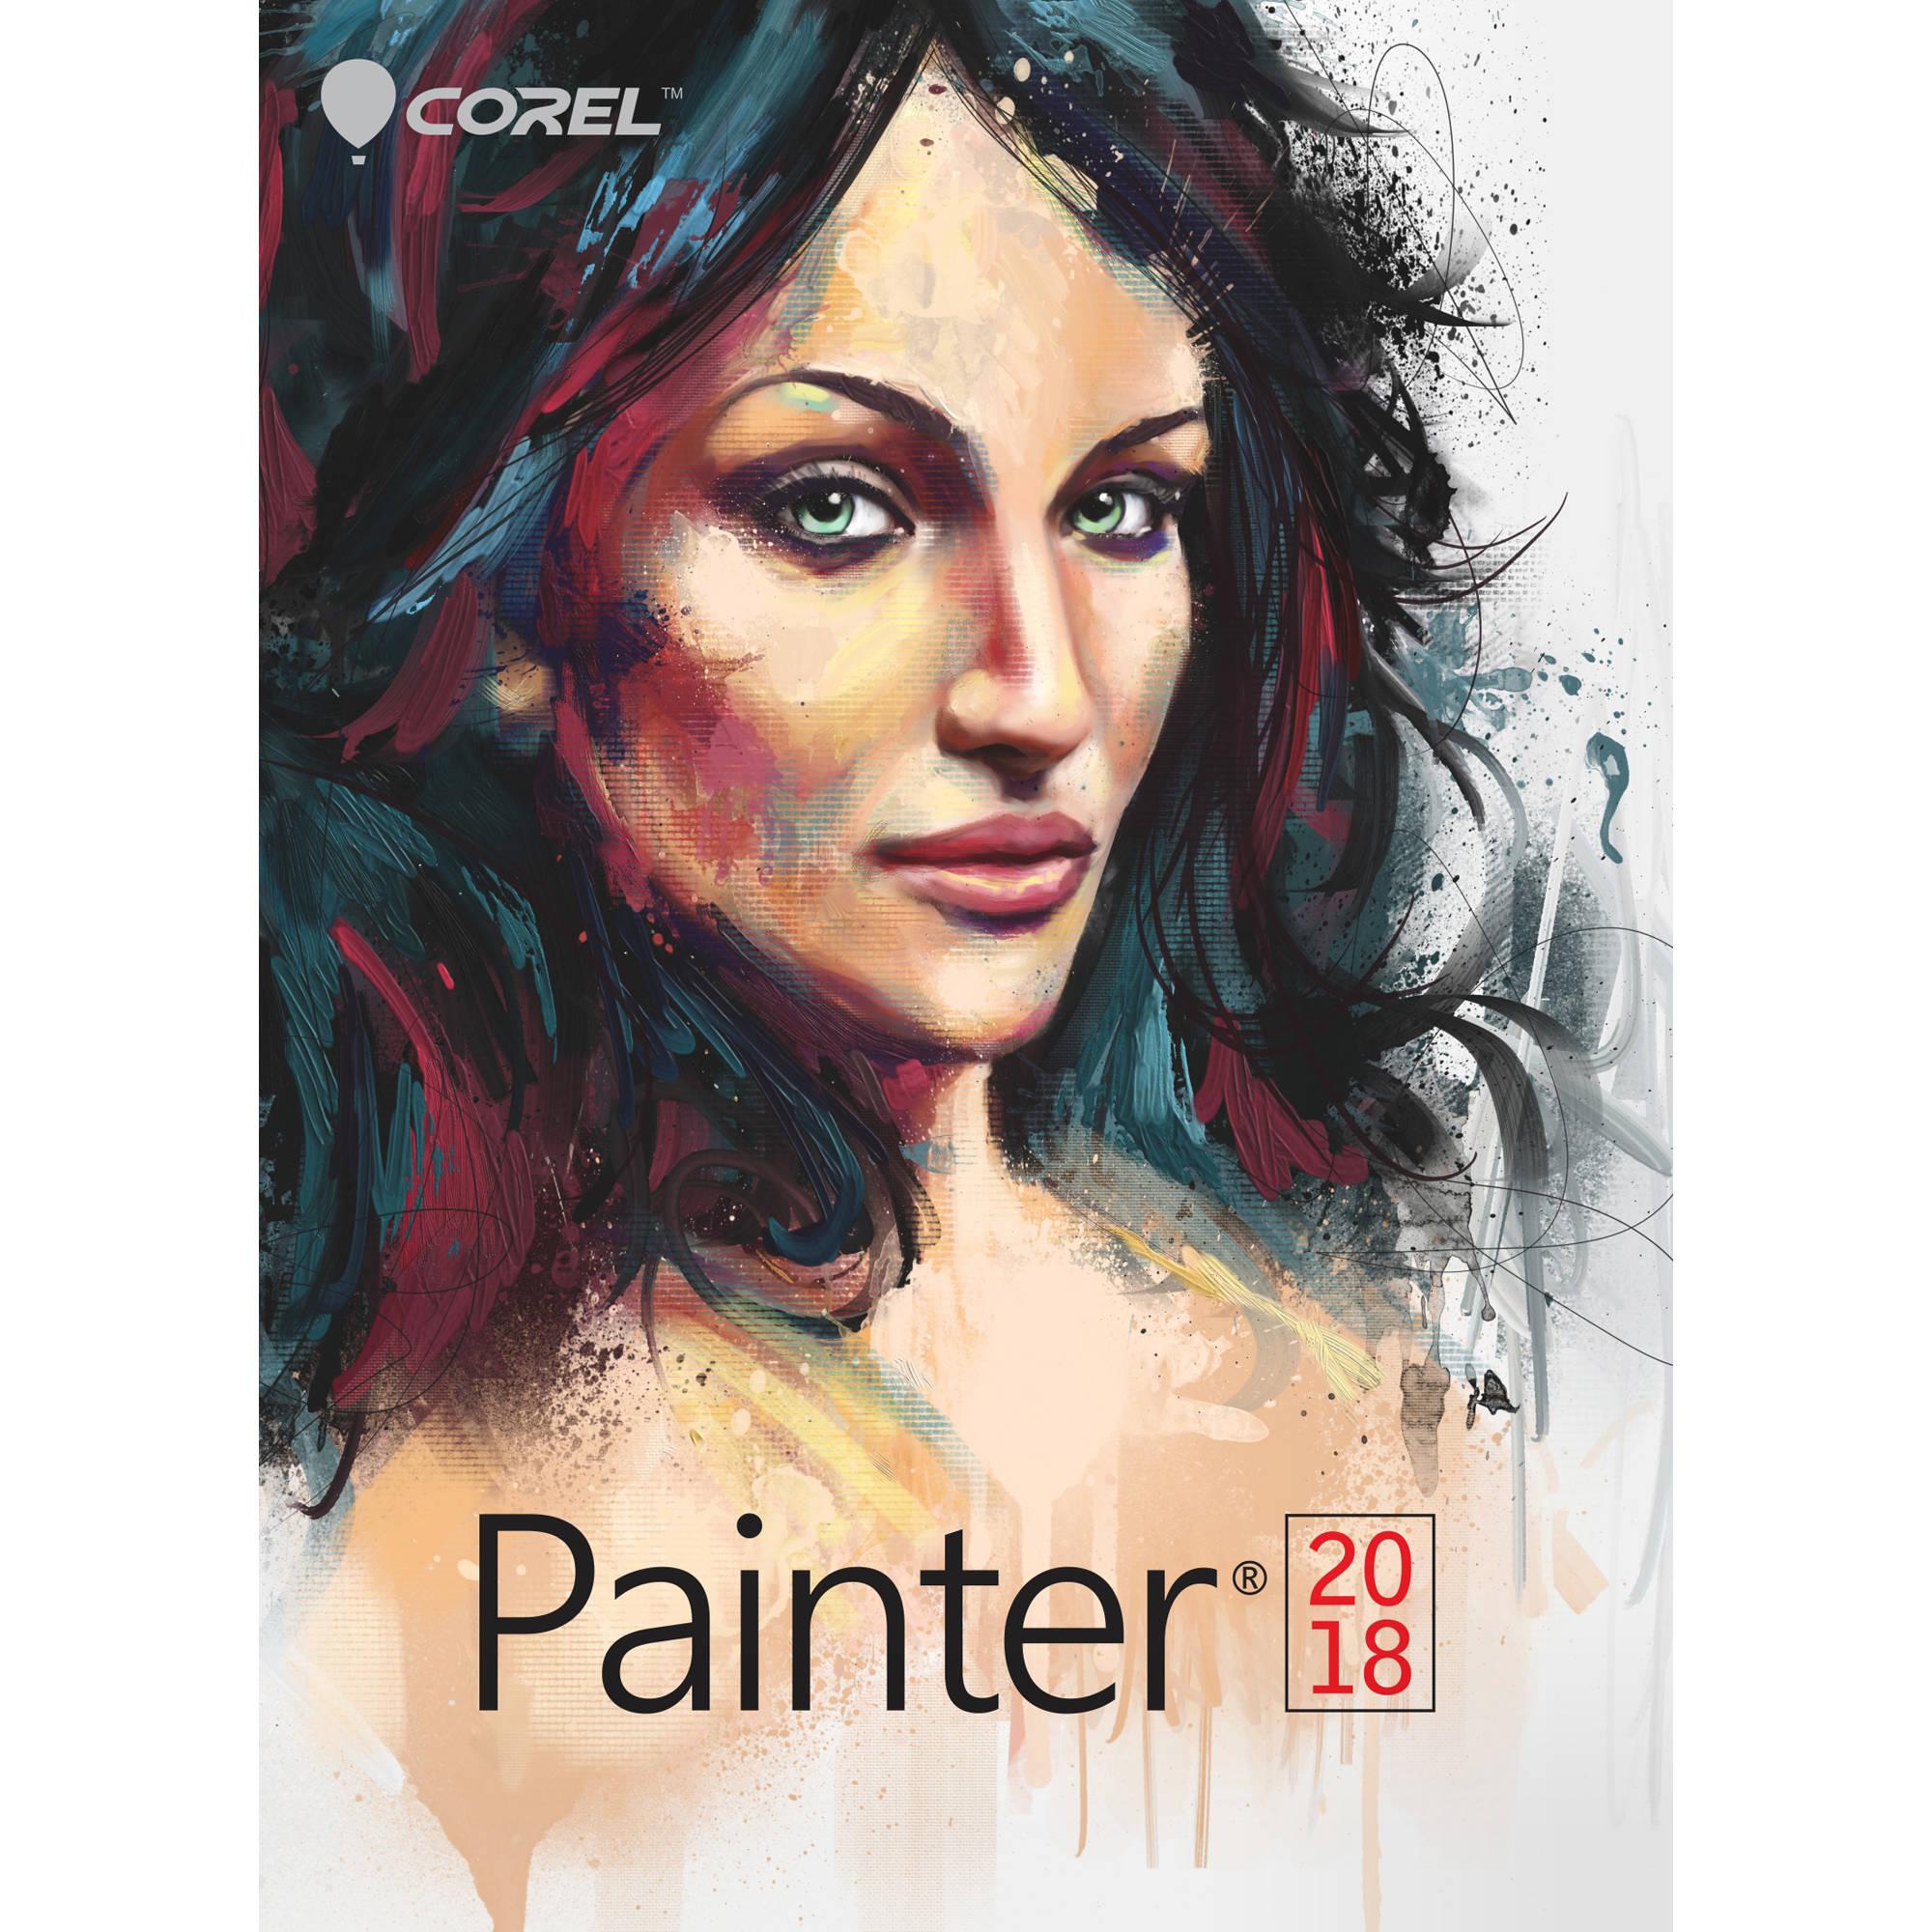 corel painter 2019 full download